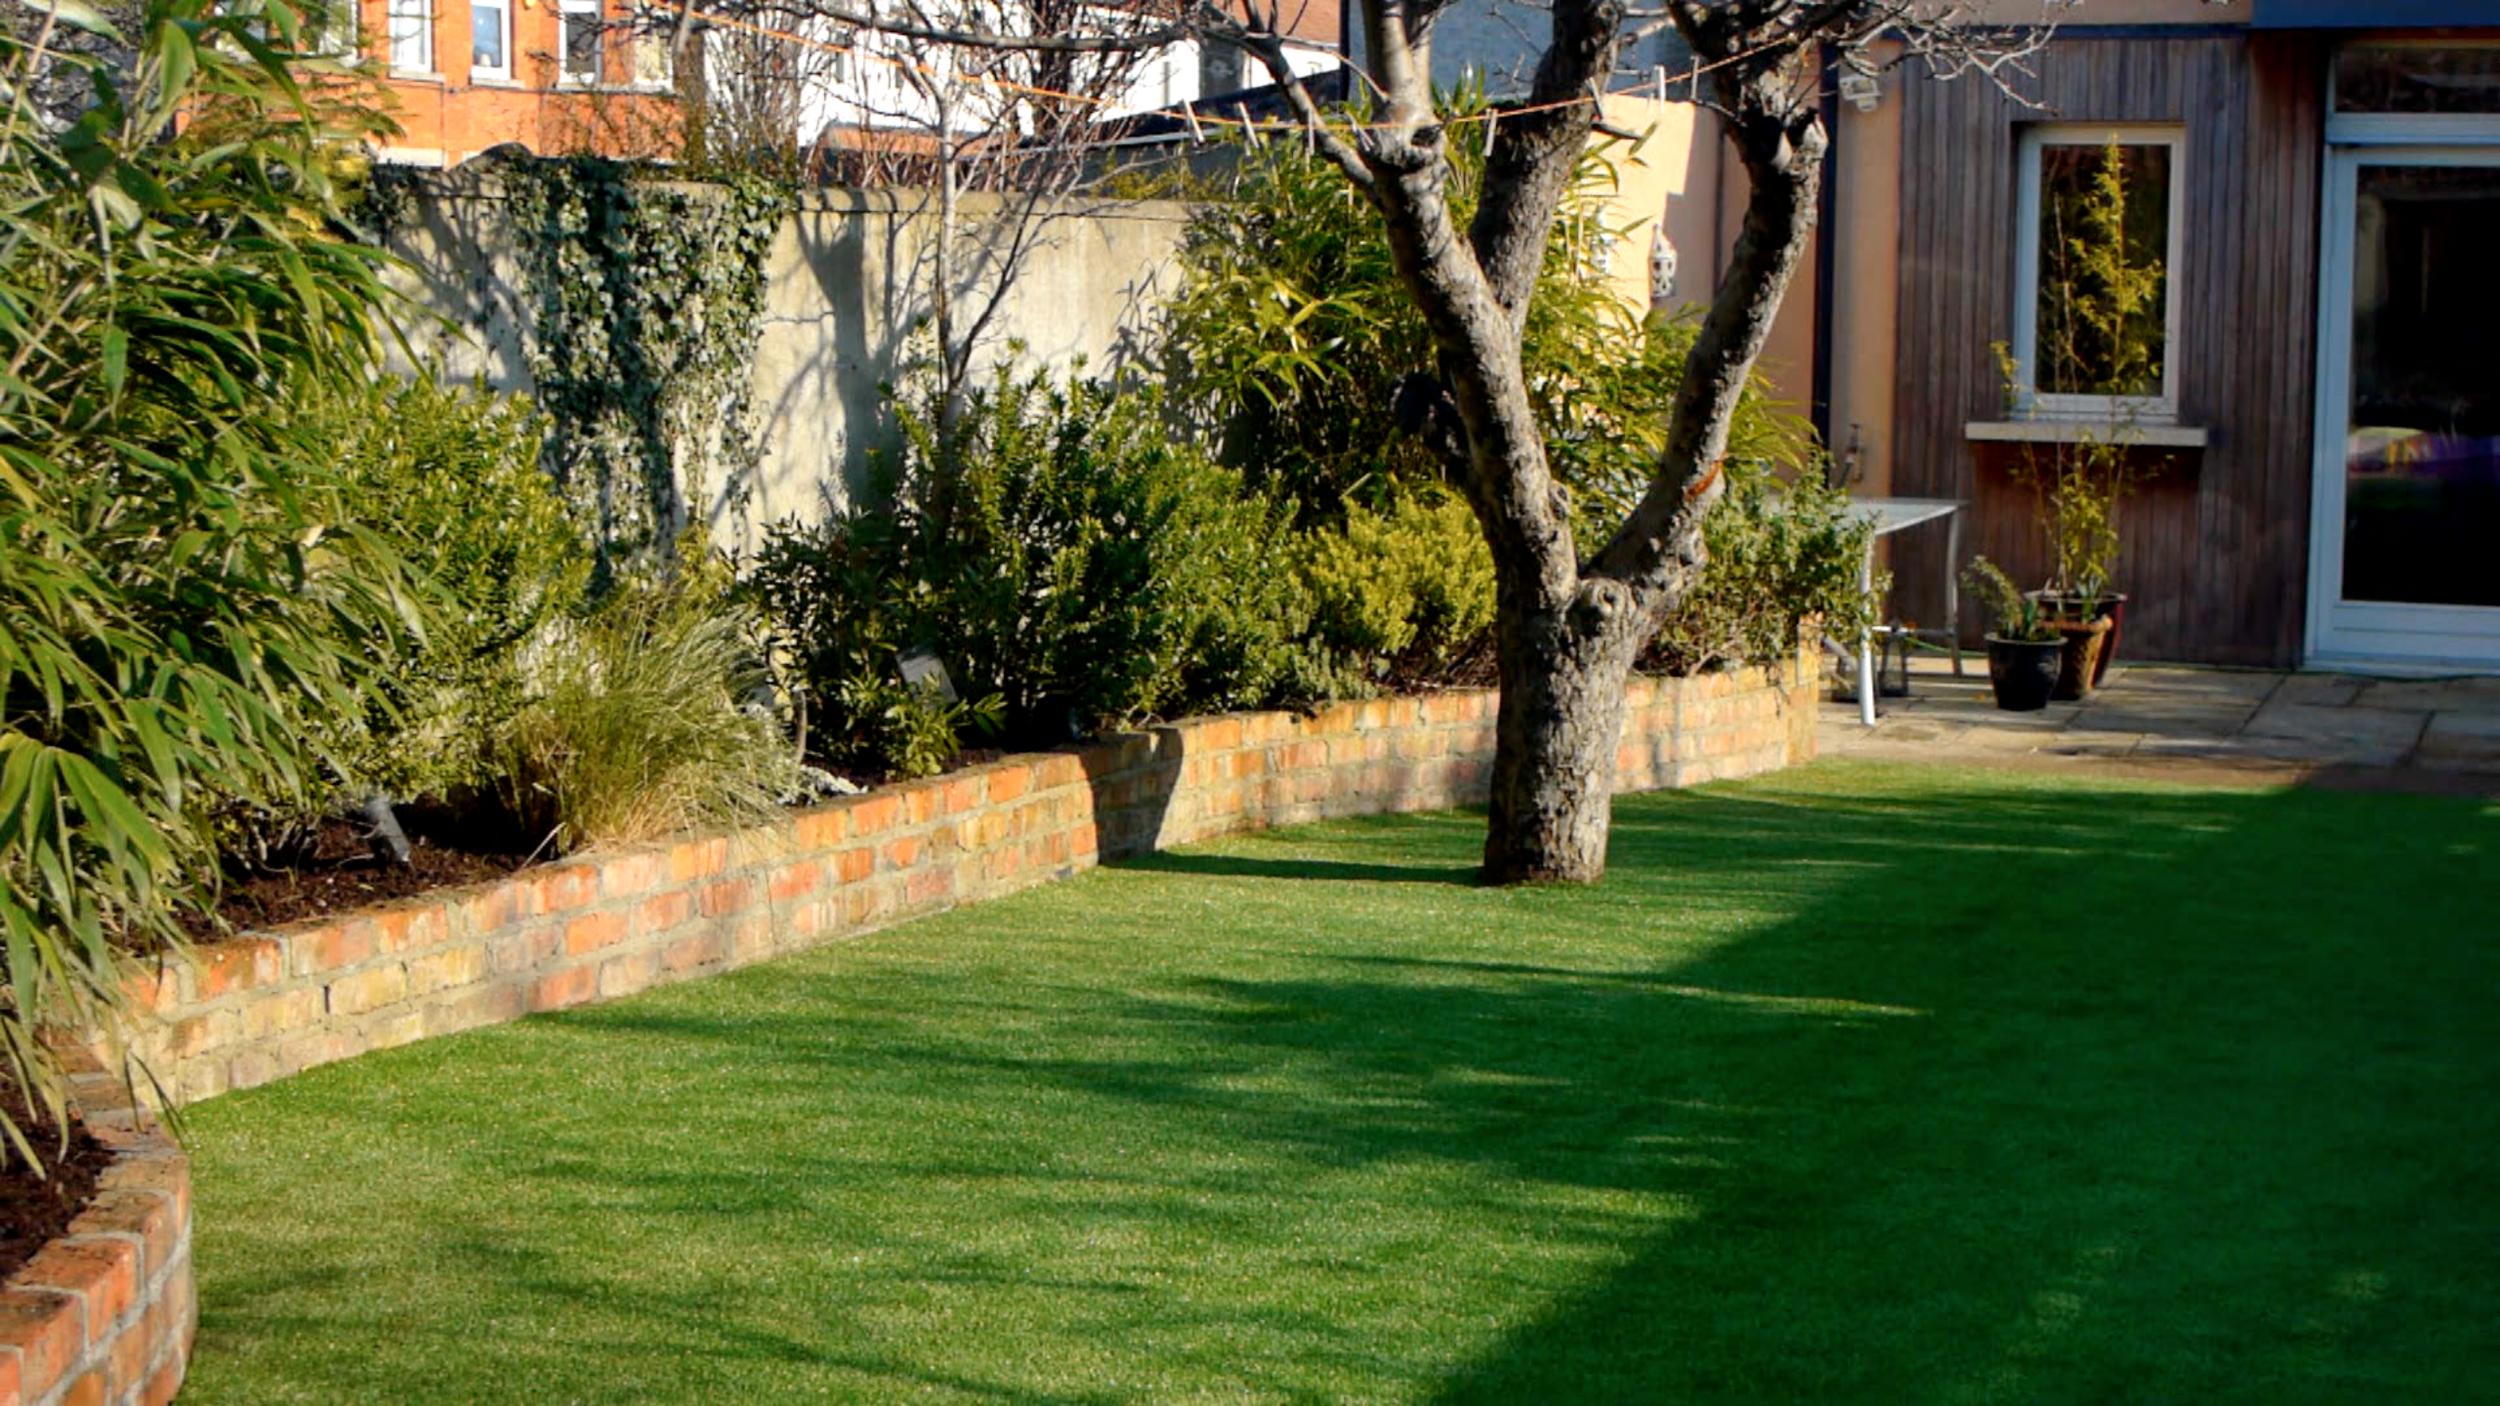 TigerTurf synthetic lawn turf